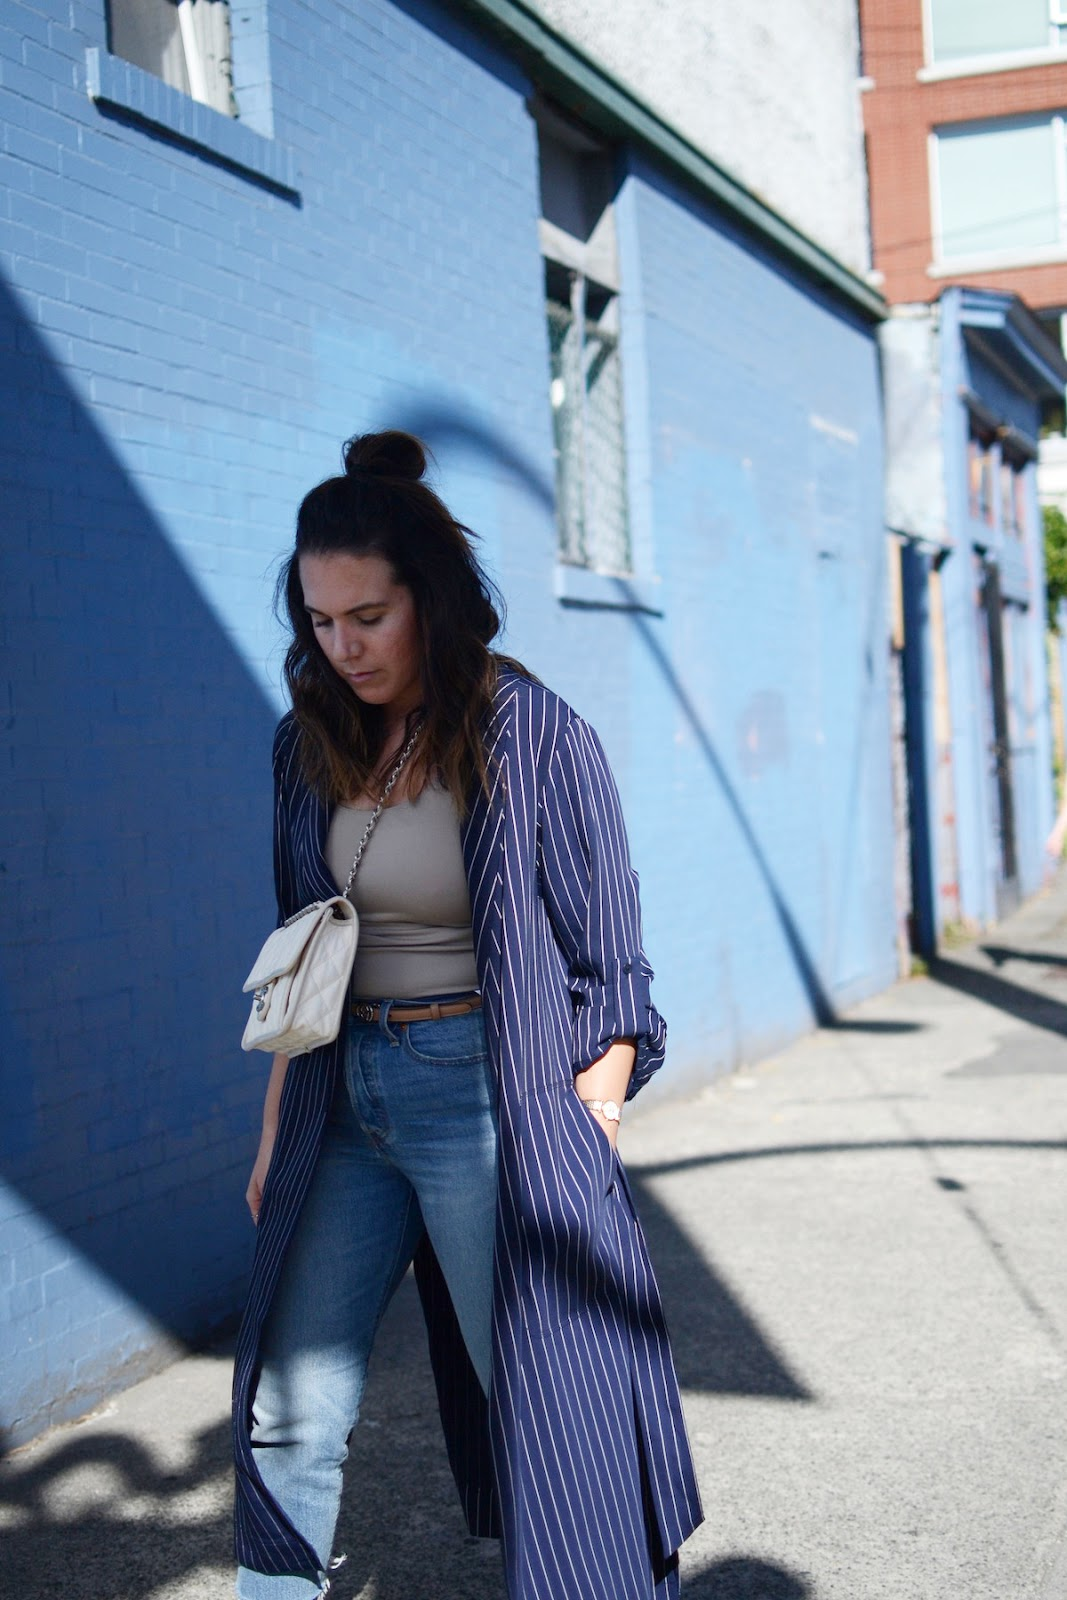 aritzia kahlo jacket vancouver fashion blogger chanel french riviera flap bag aleesha harris